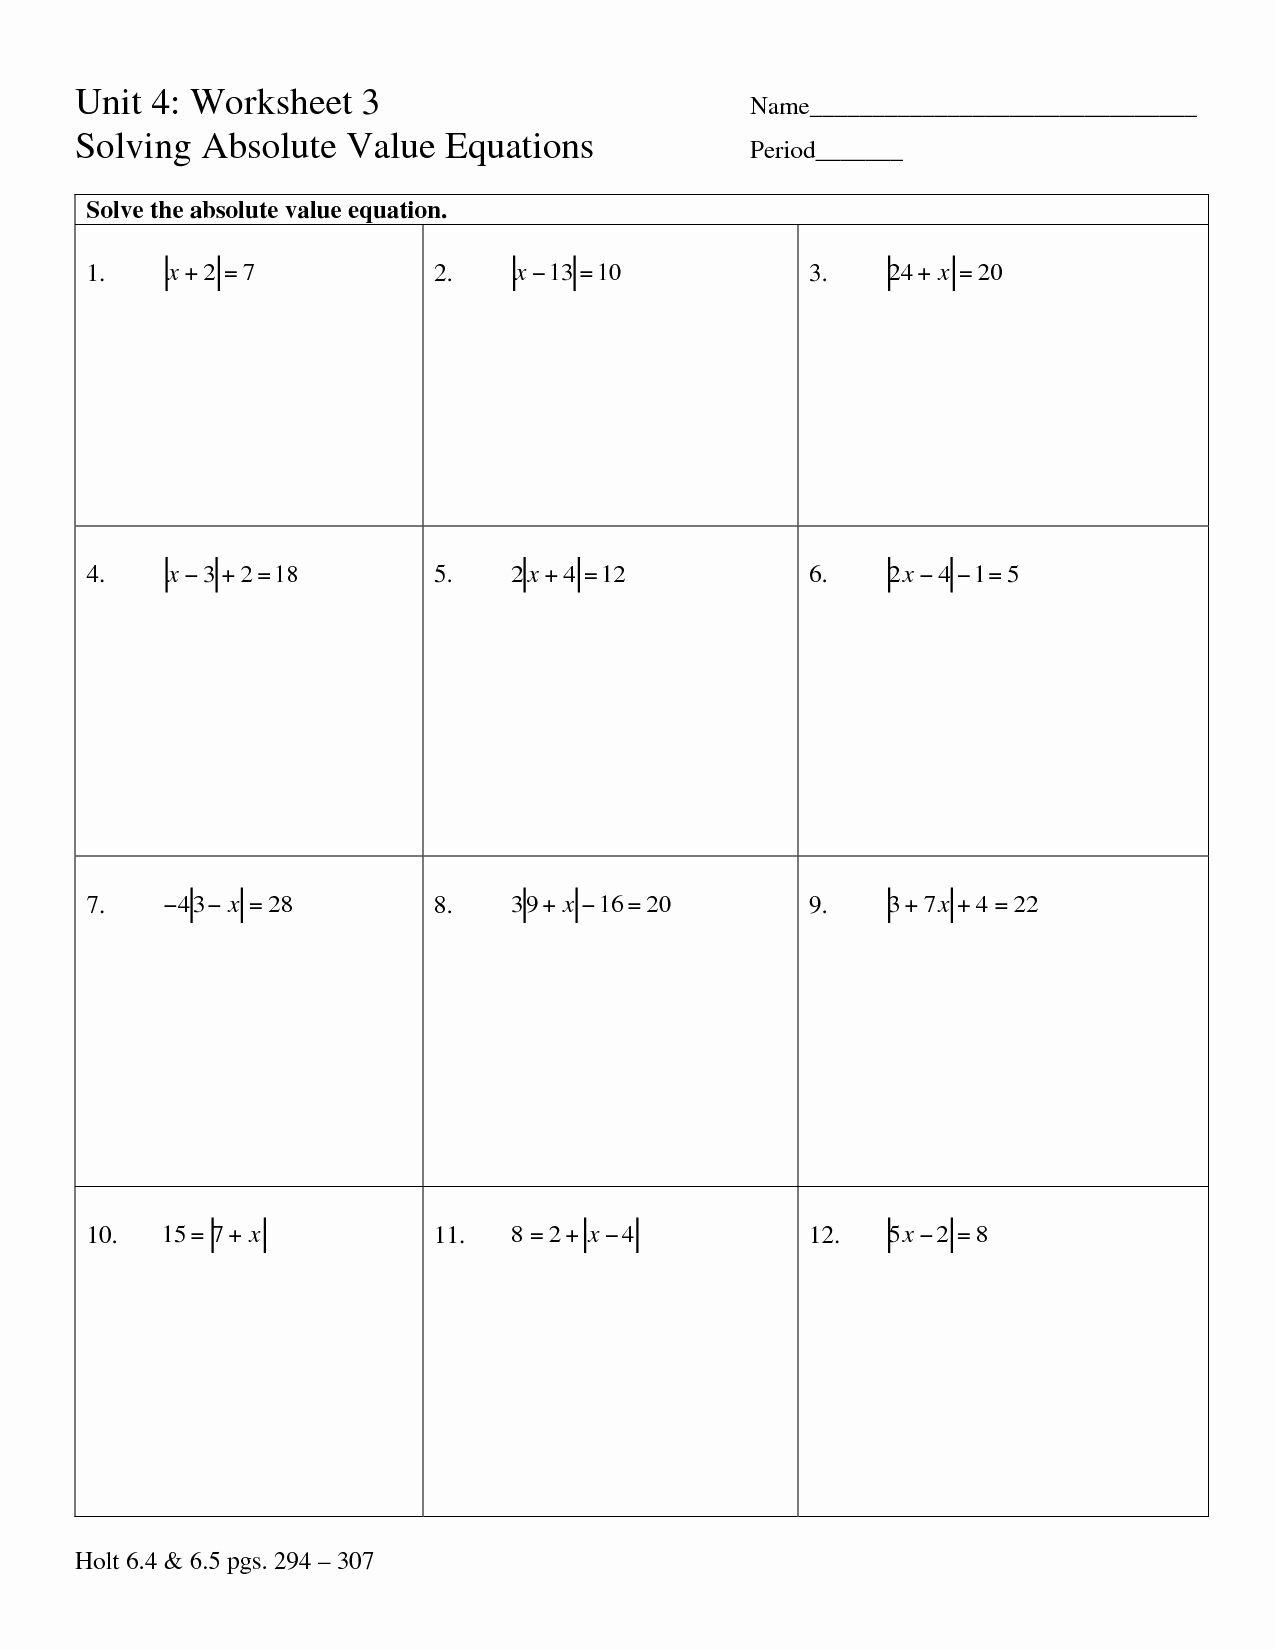 Absolute Value Inequalities Worksheet Answers New Worksheet Solving Absolute Value Equat In 2020 Absolute Value Equations Solving Equations Absolute Value Inequalities